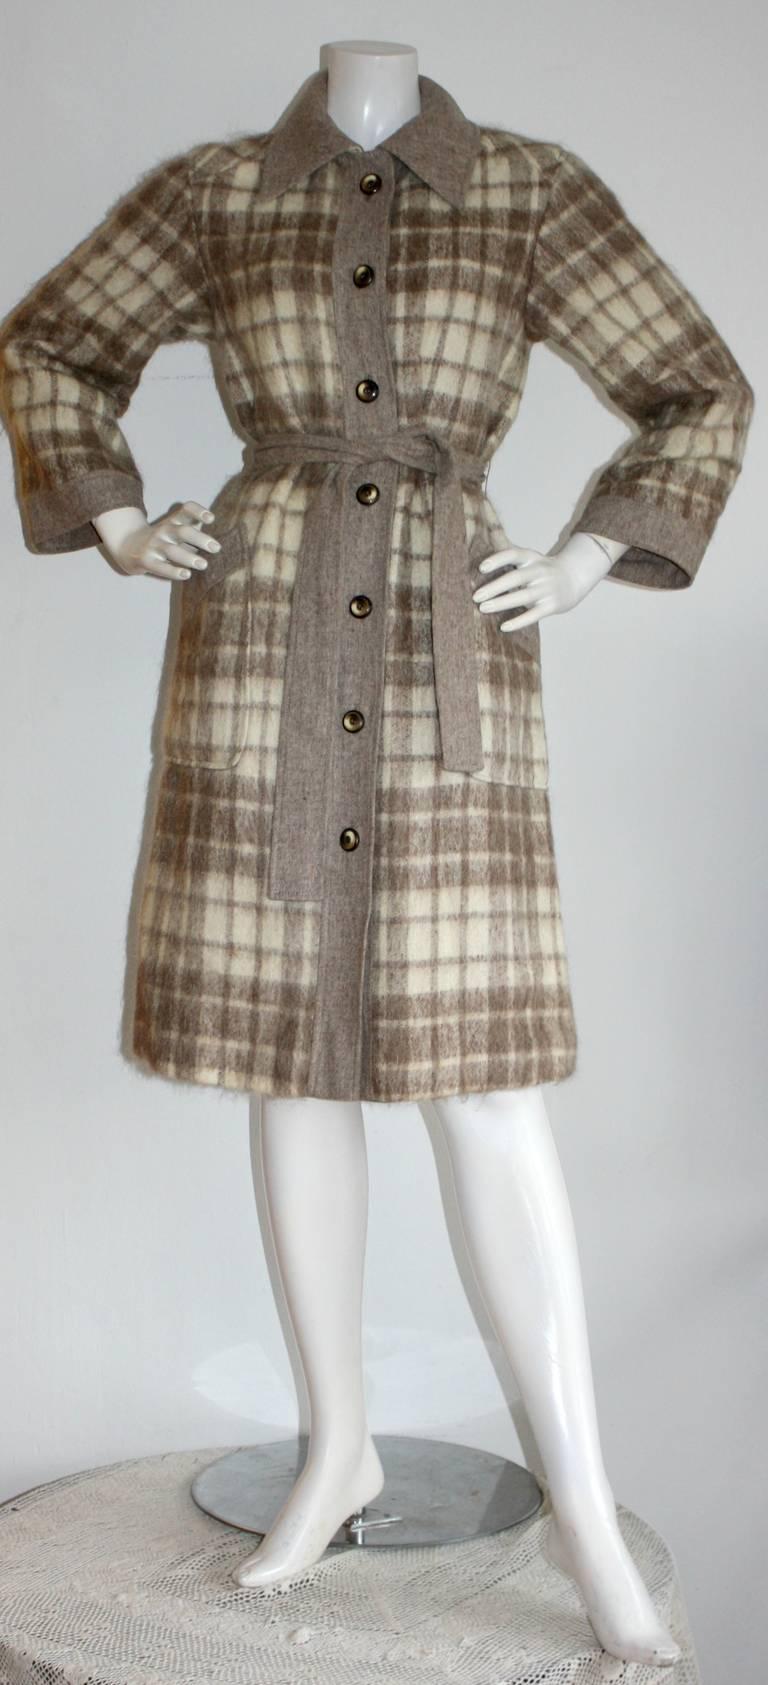 Vintage Pierre Cardin Heathered Camel Tartan Plaid Belted Wool Coat 4